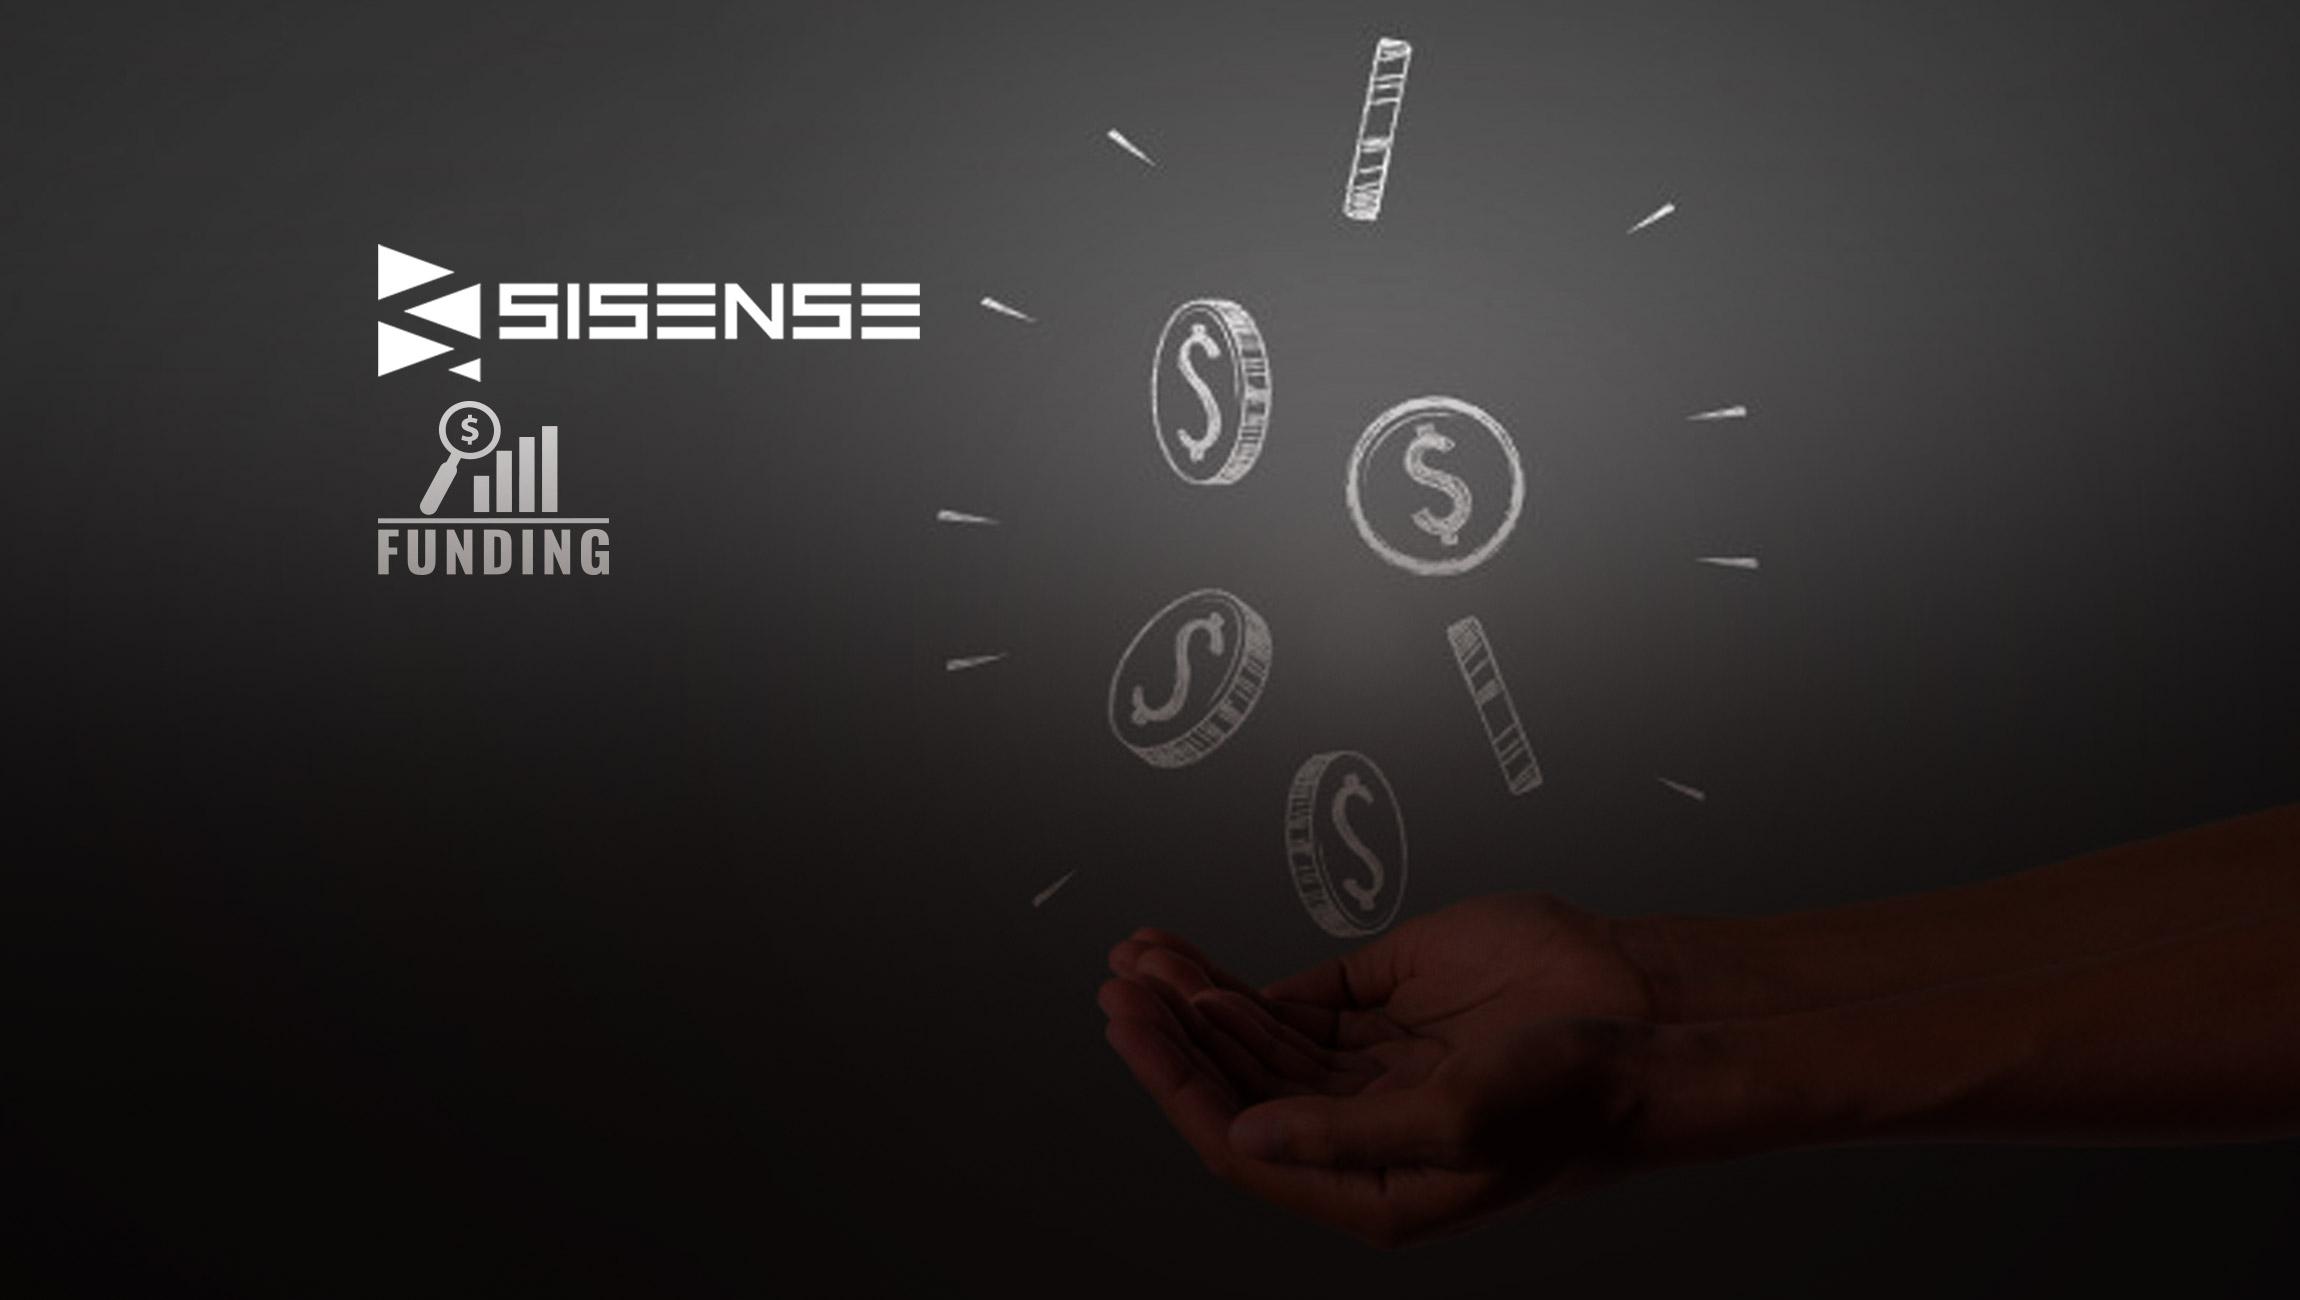 Business Analytics Company Sisense Raises Over $100m